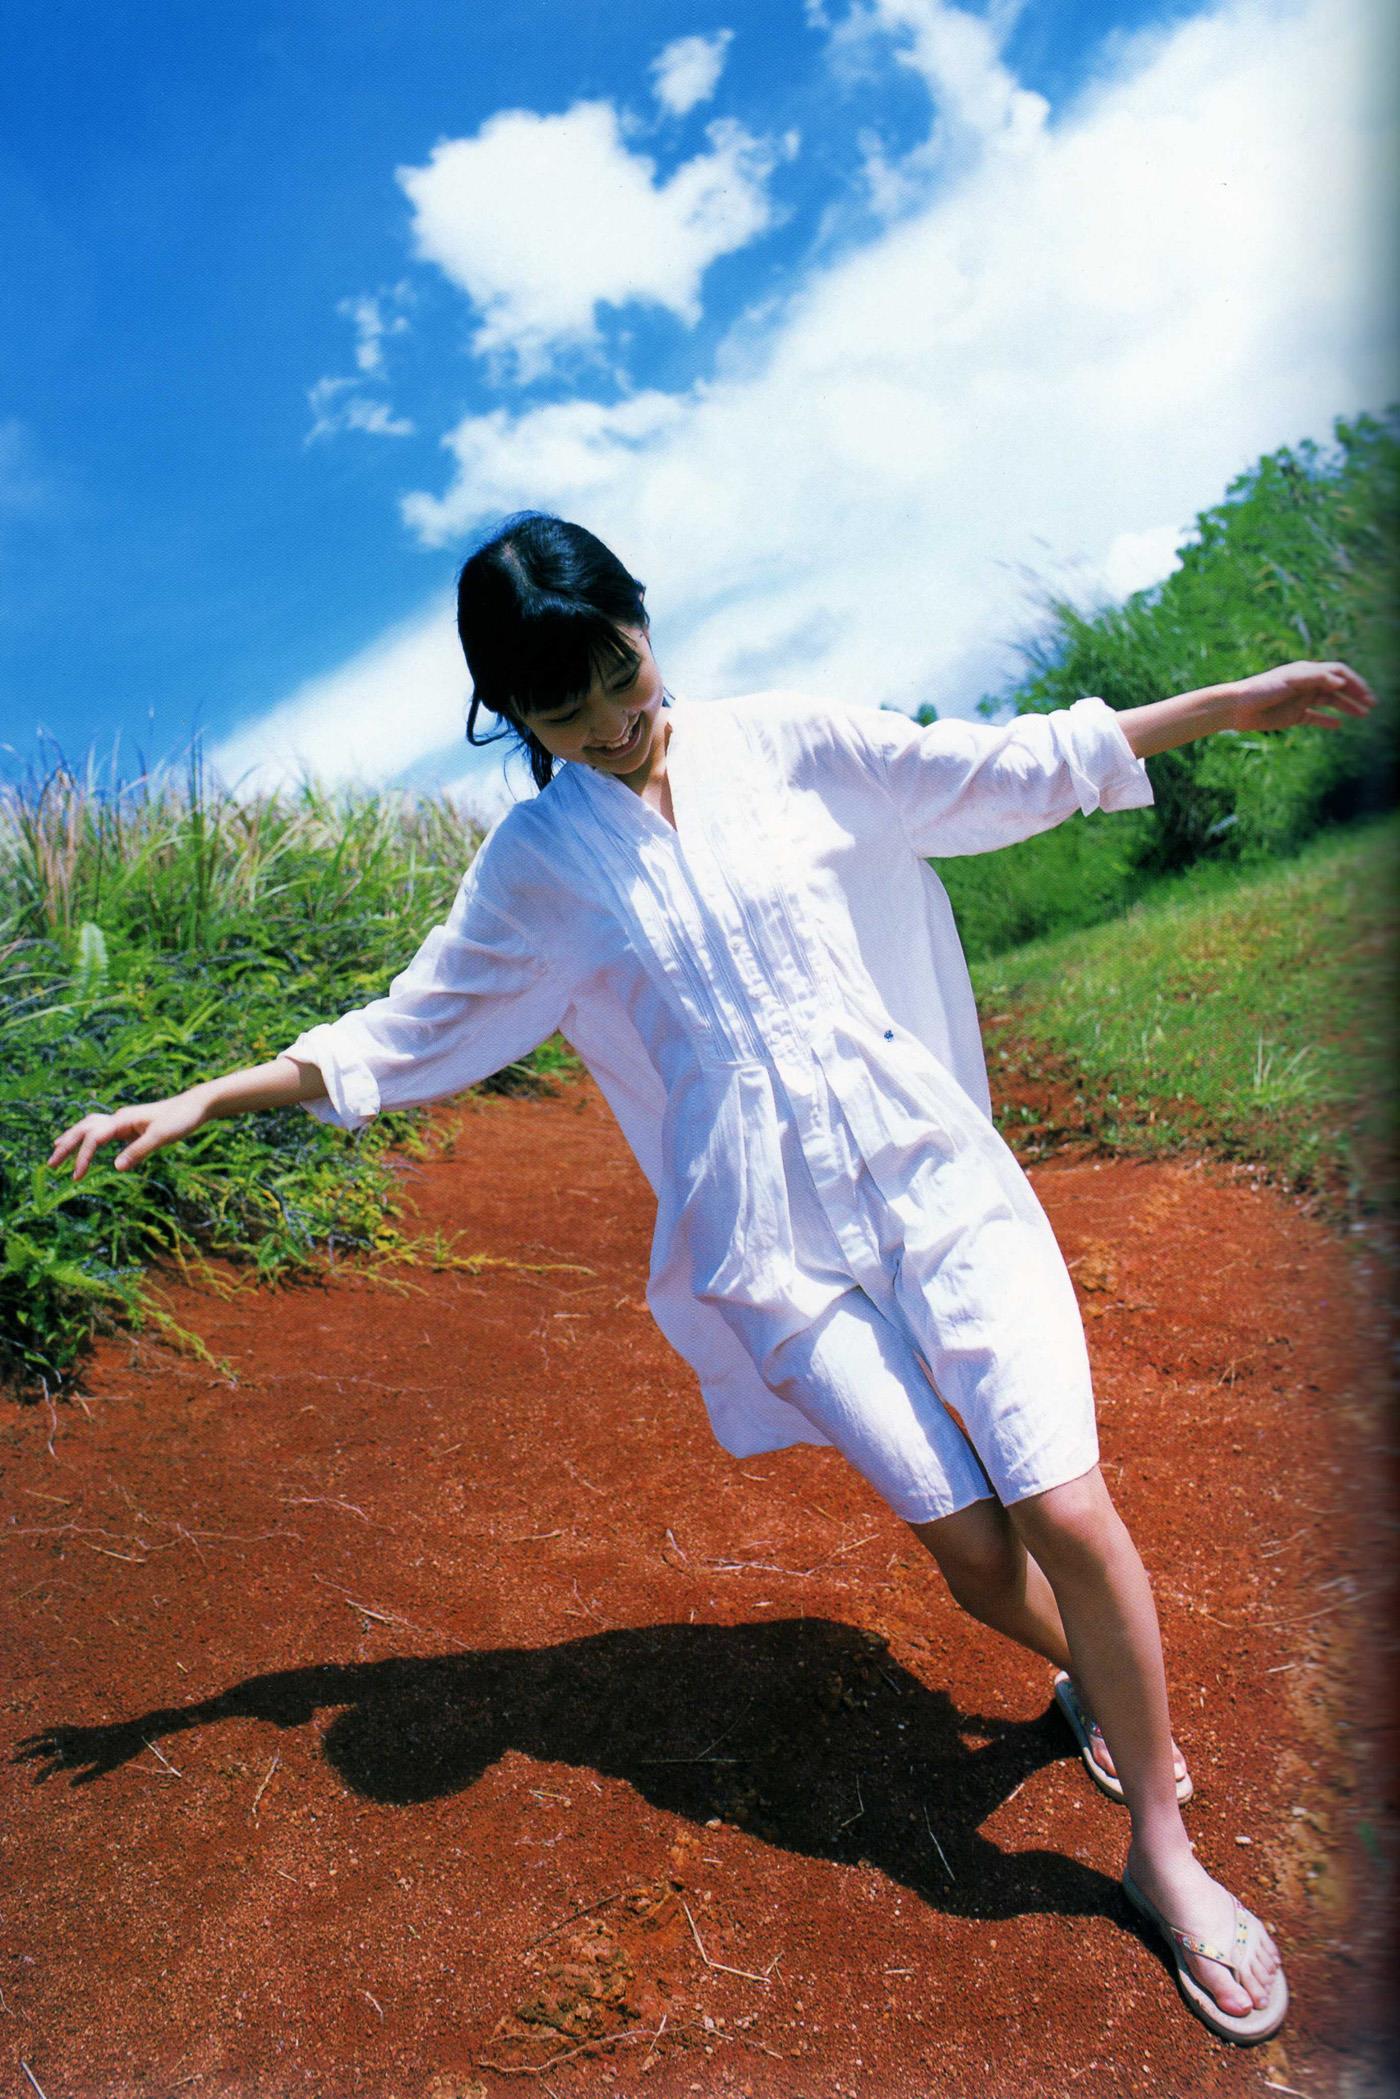 真野恵里菜 エロ画像 80